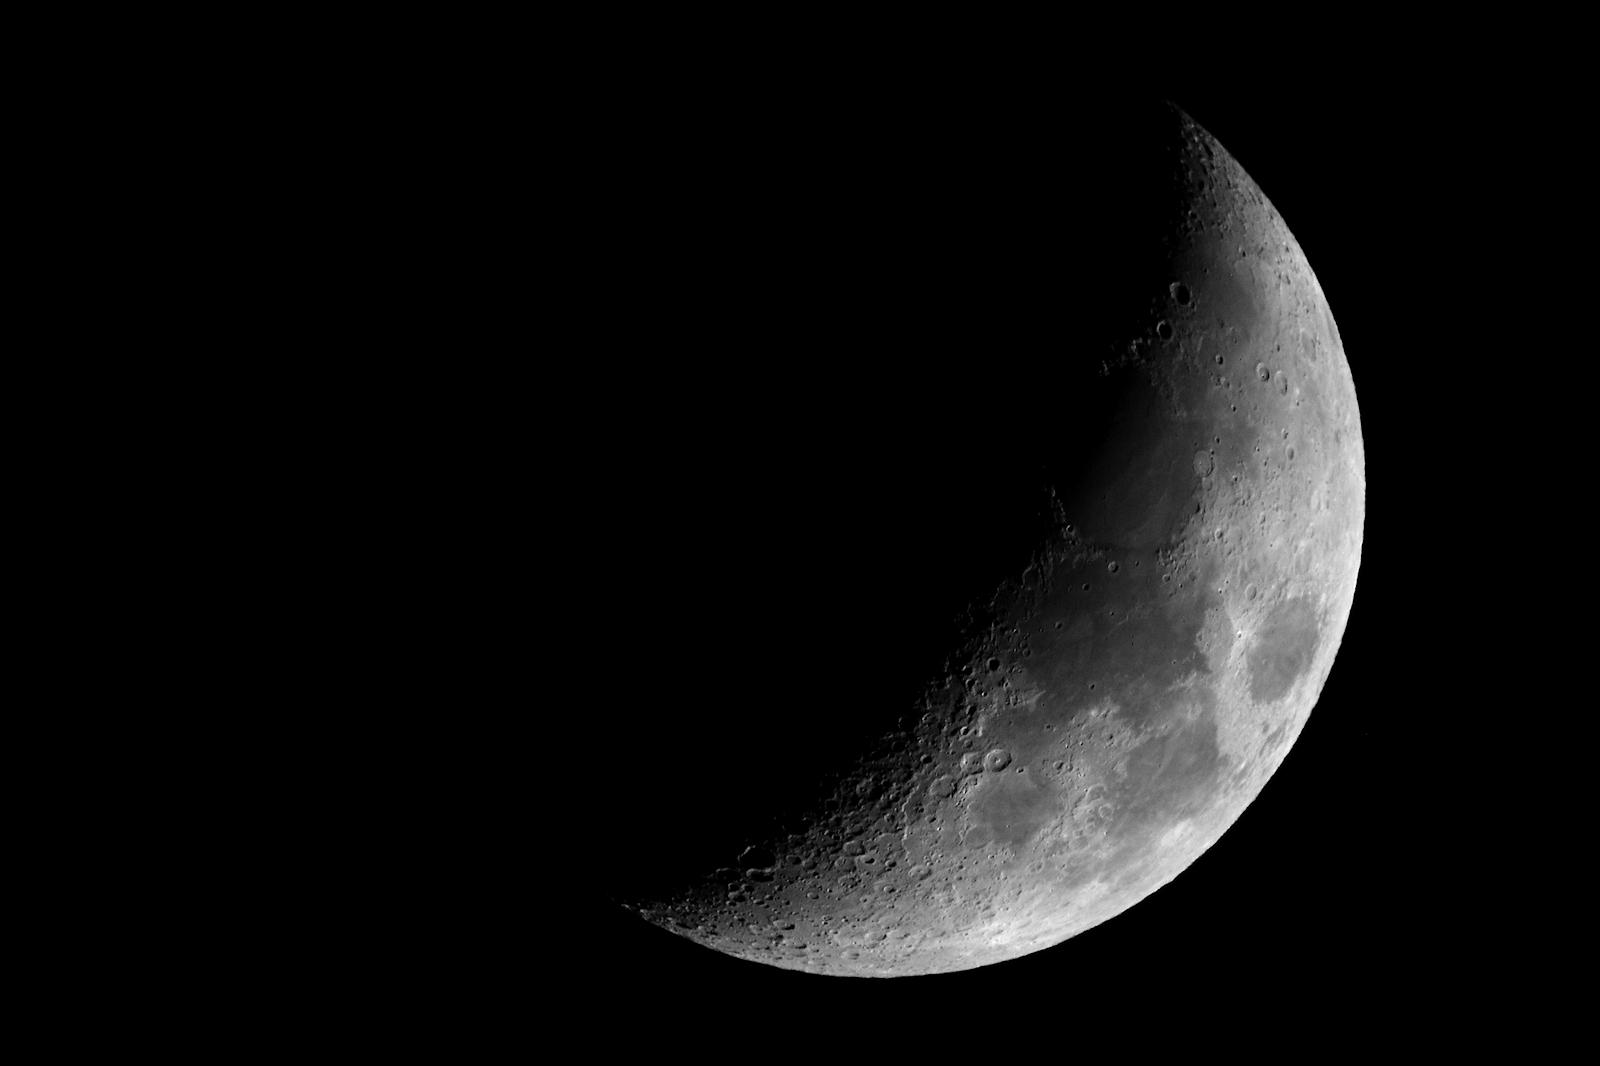 Spicchio di Luna...